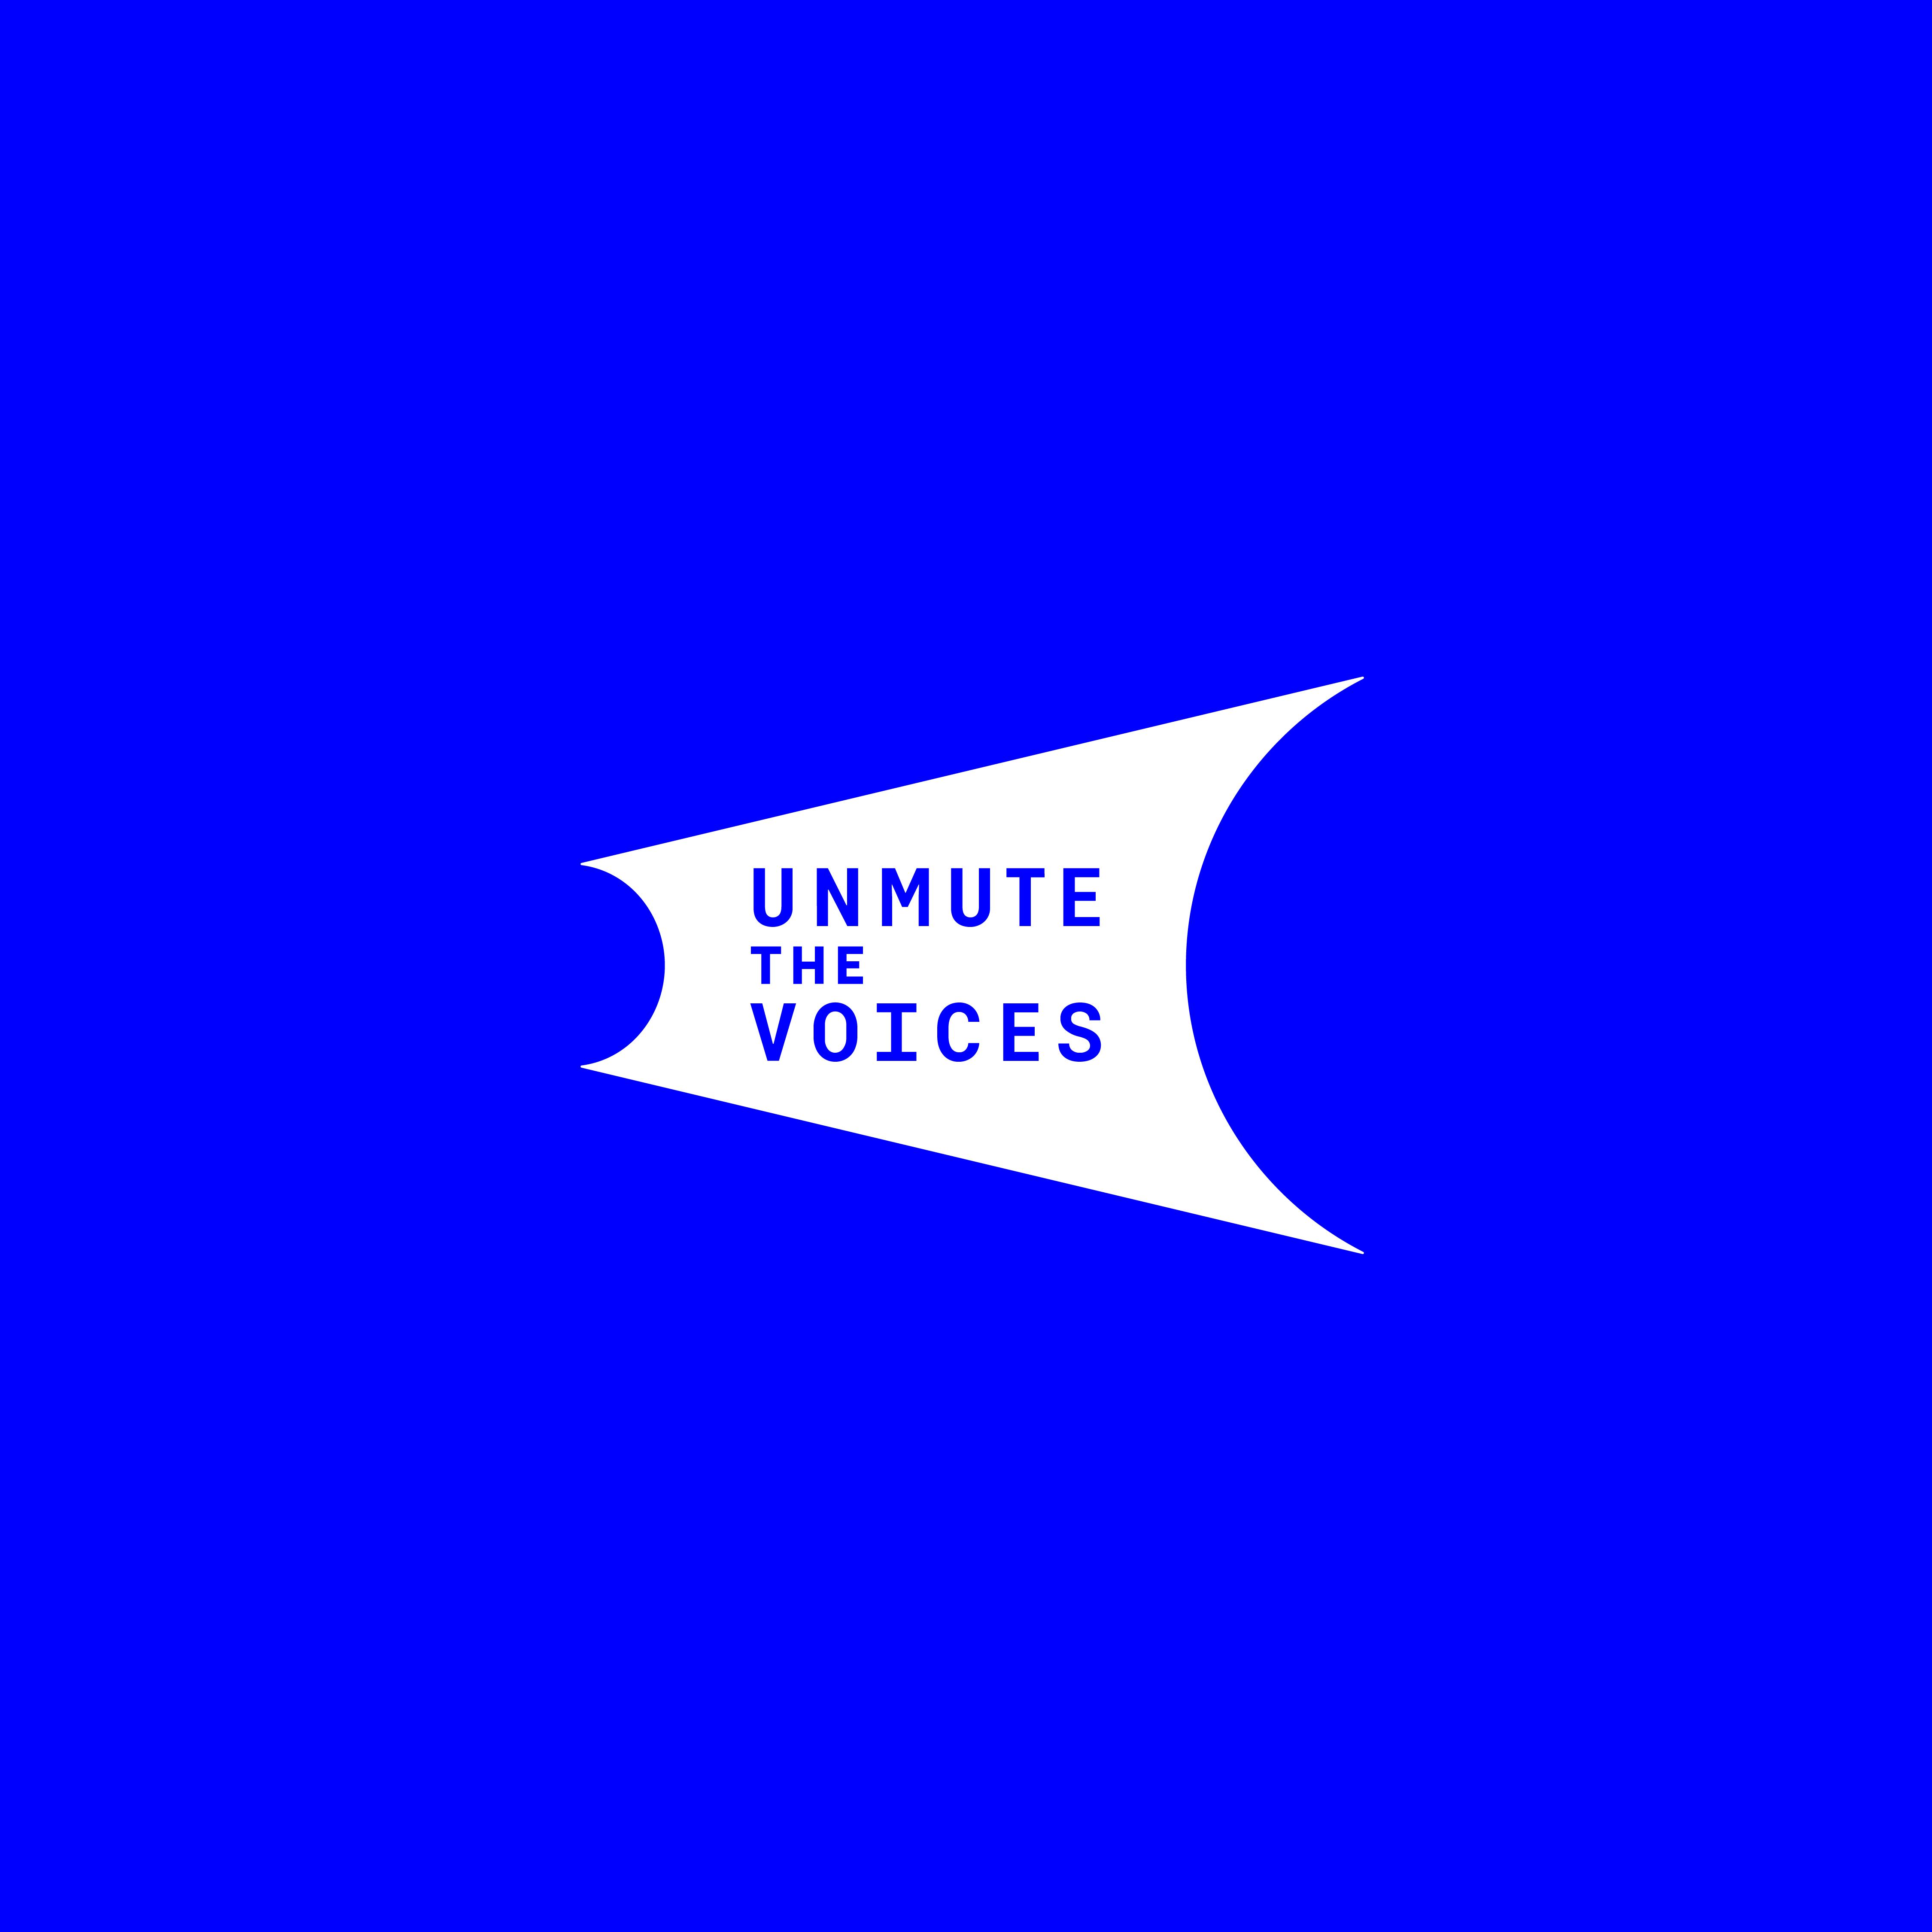 """Unmute The Voices"" logo"